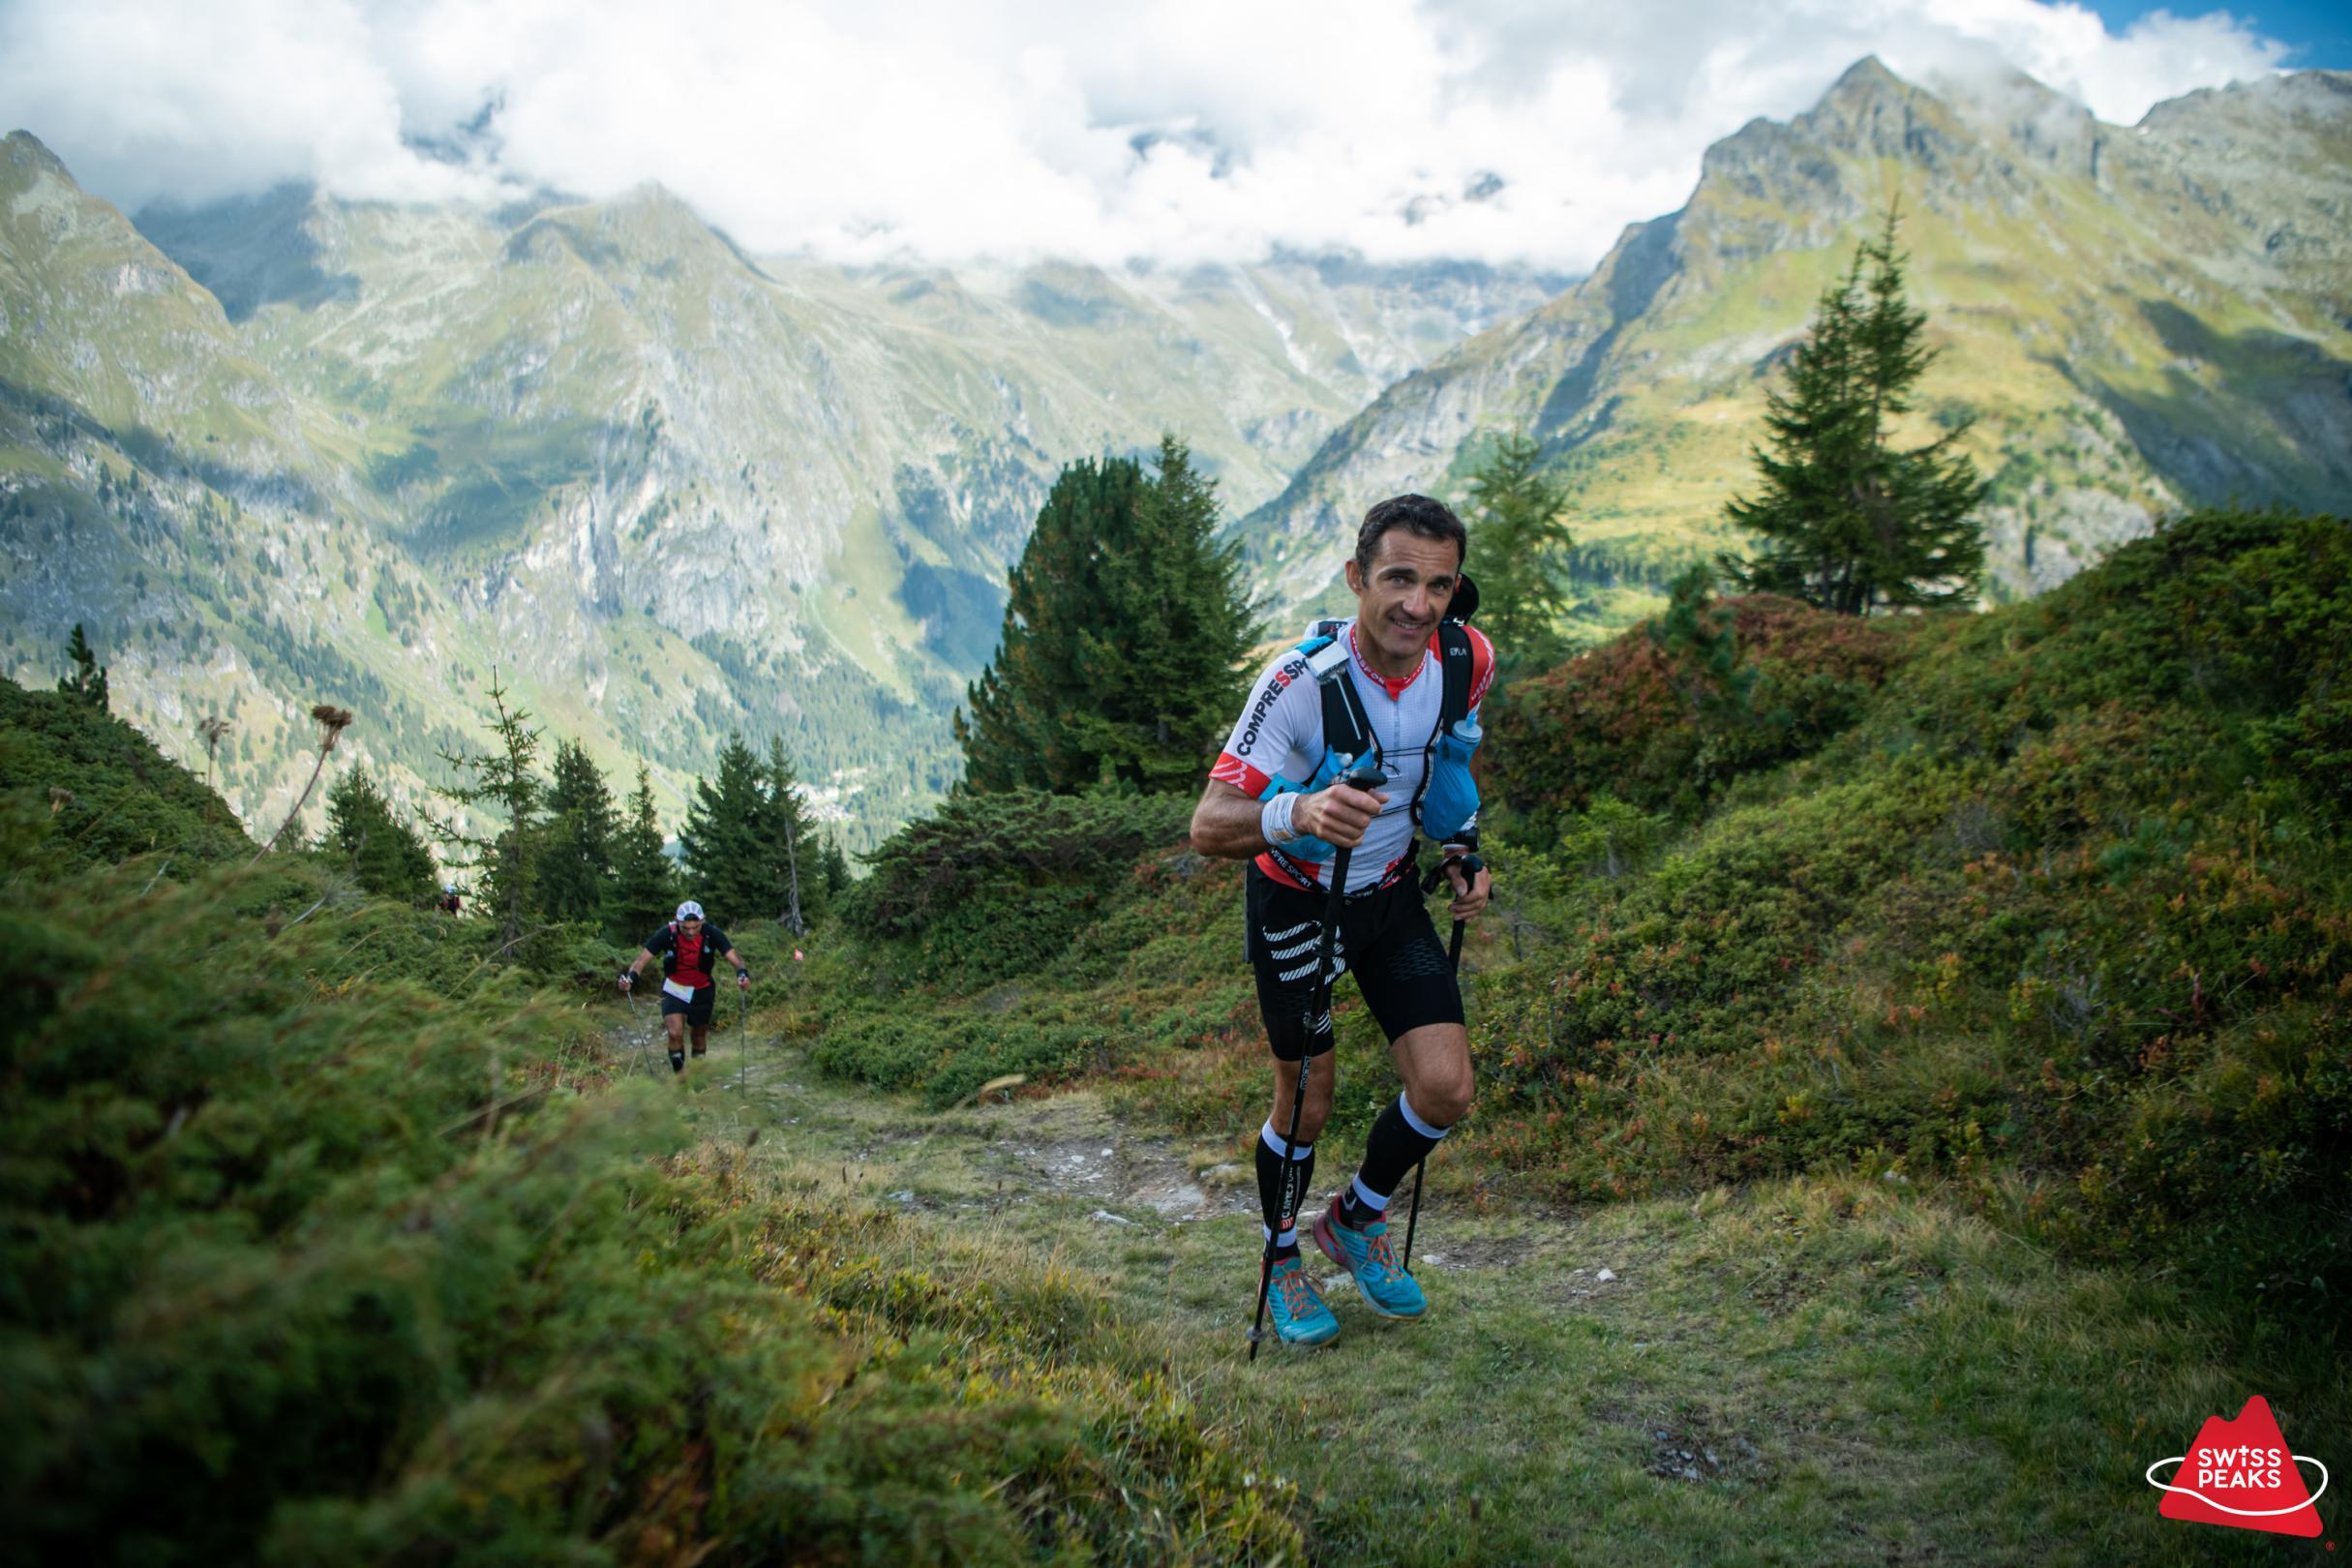 SwissPeaks Trail_Coureur monte brouillard.jpg